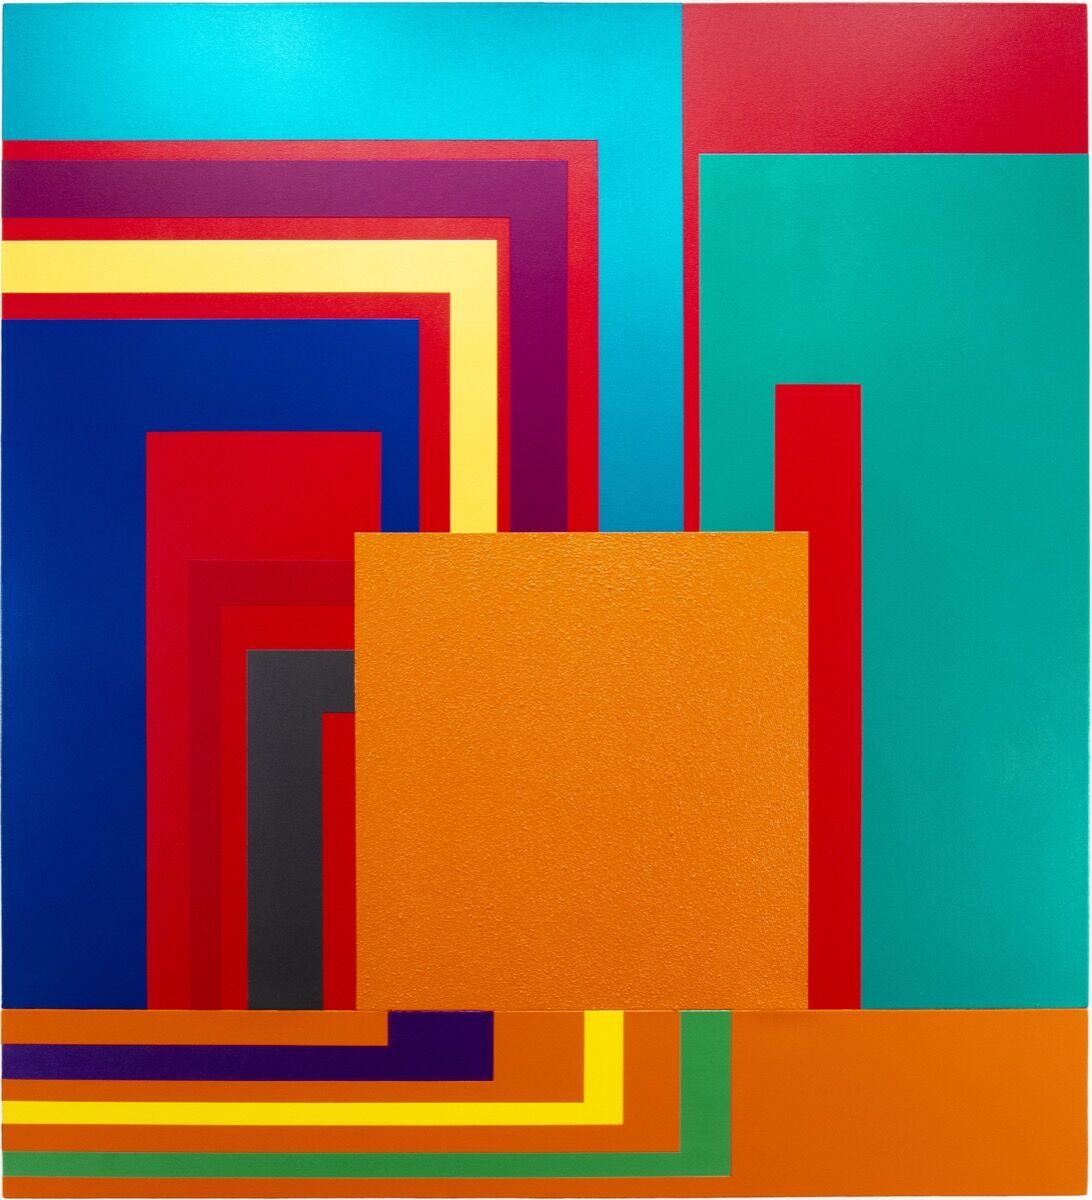 Peter Halley, Emulation, 2002. Courtesy of Sperone Westwater, New York.